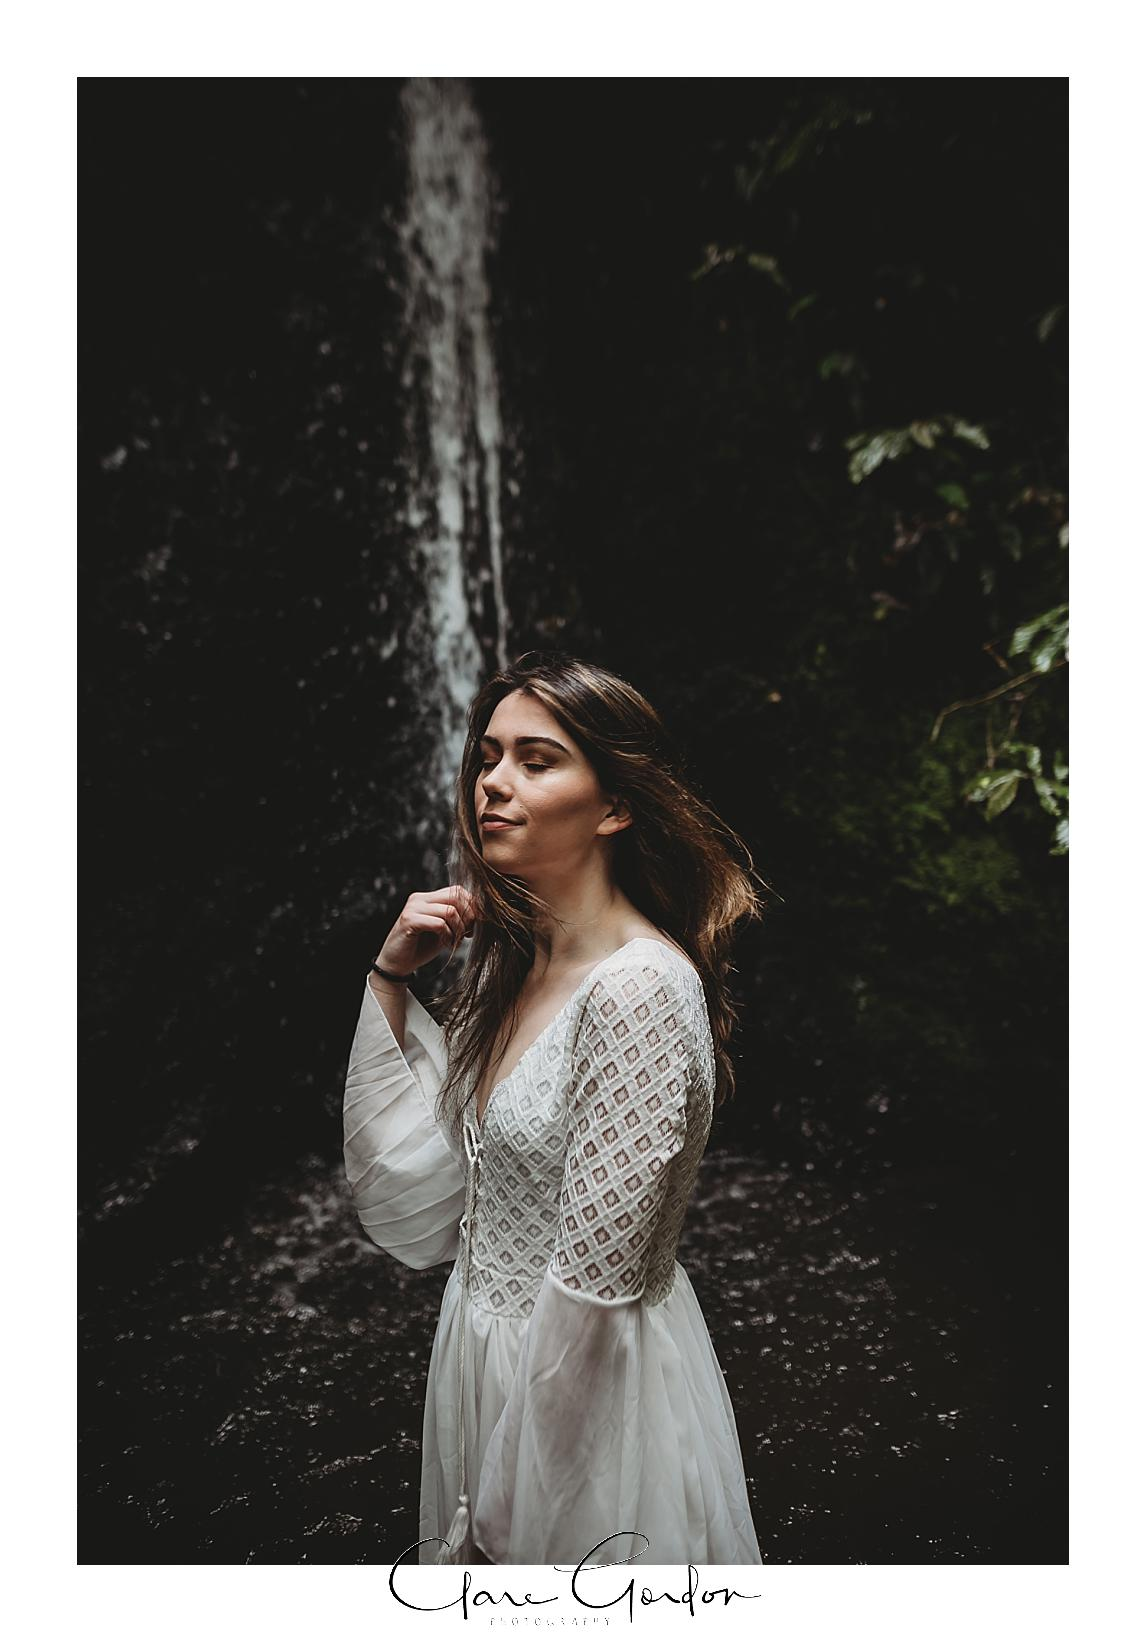 boho-bride-Shoot-Waikato-Wedding-photography-Girl-in Waterfall -New Zealand-wedding (5).jpg